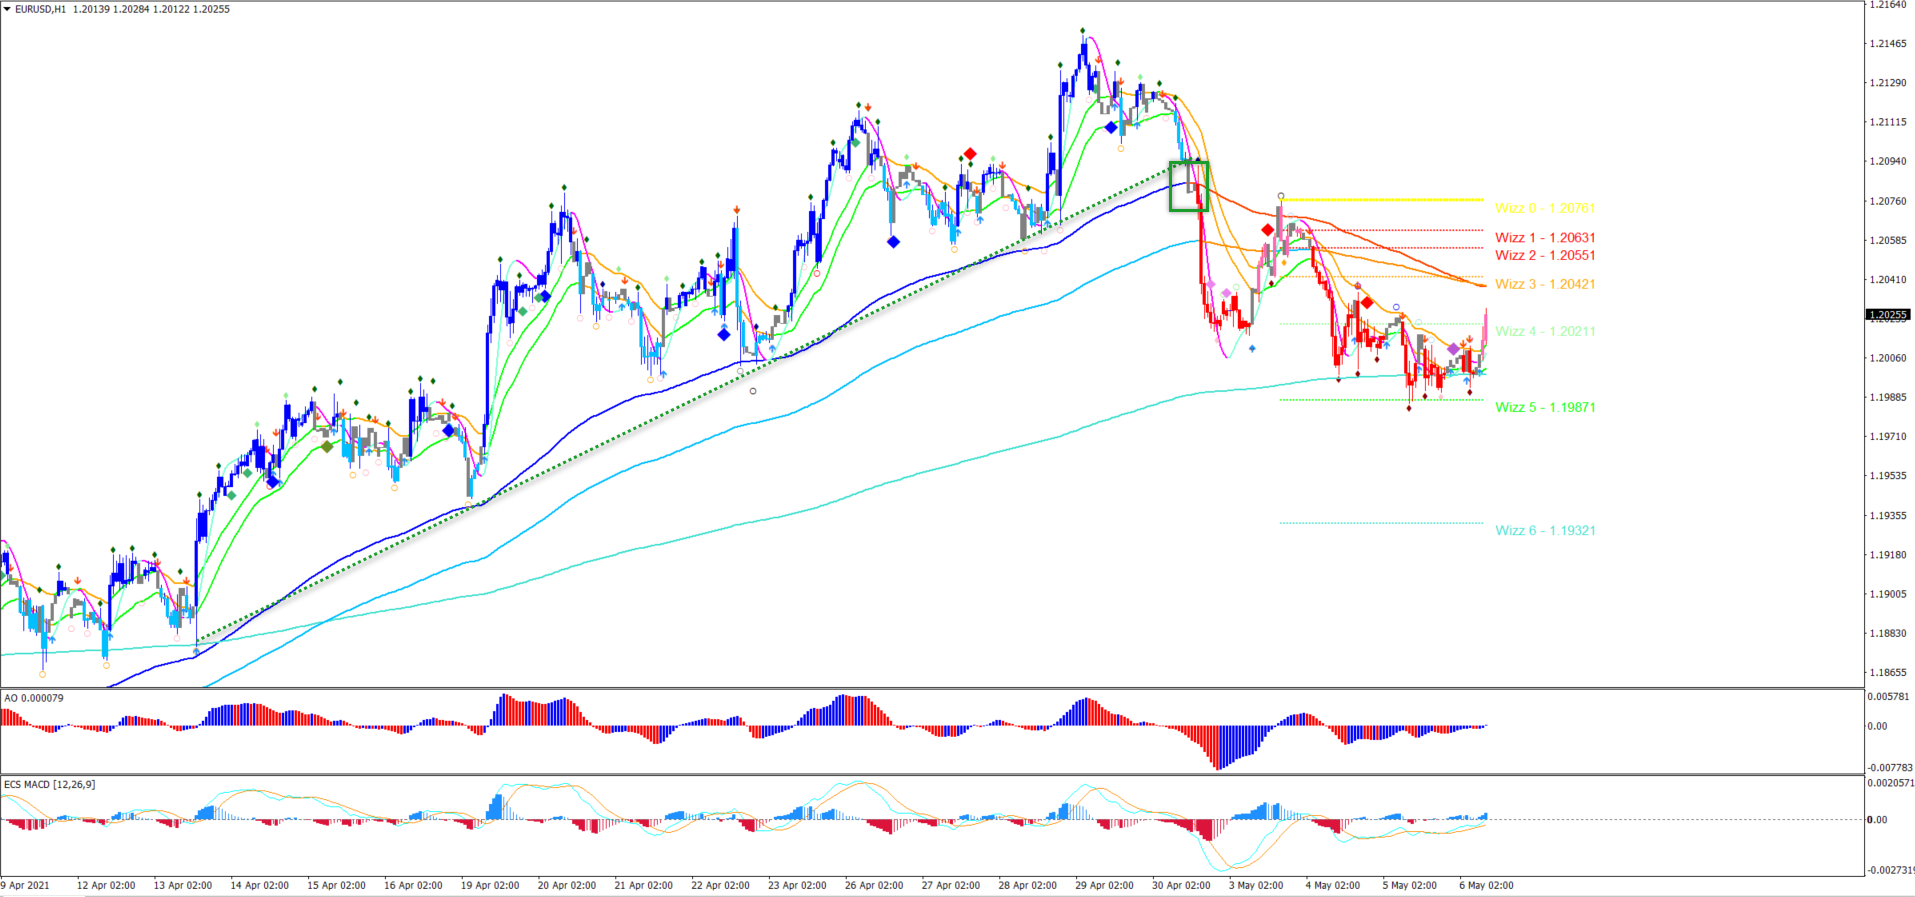 EUR/USD 1 hour chart 6.5.2021